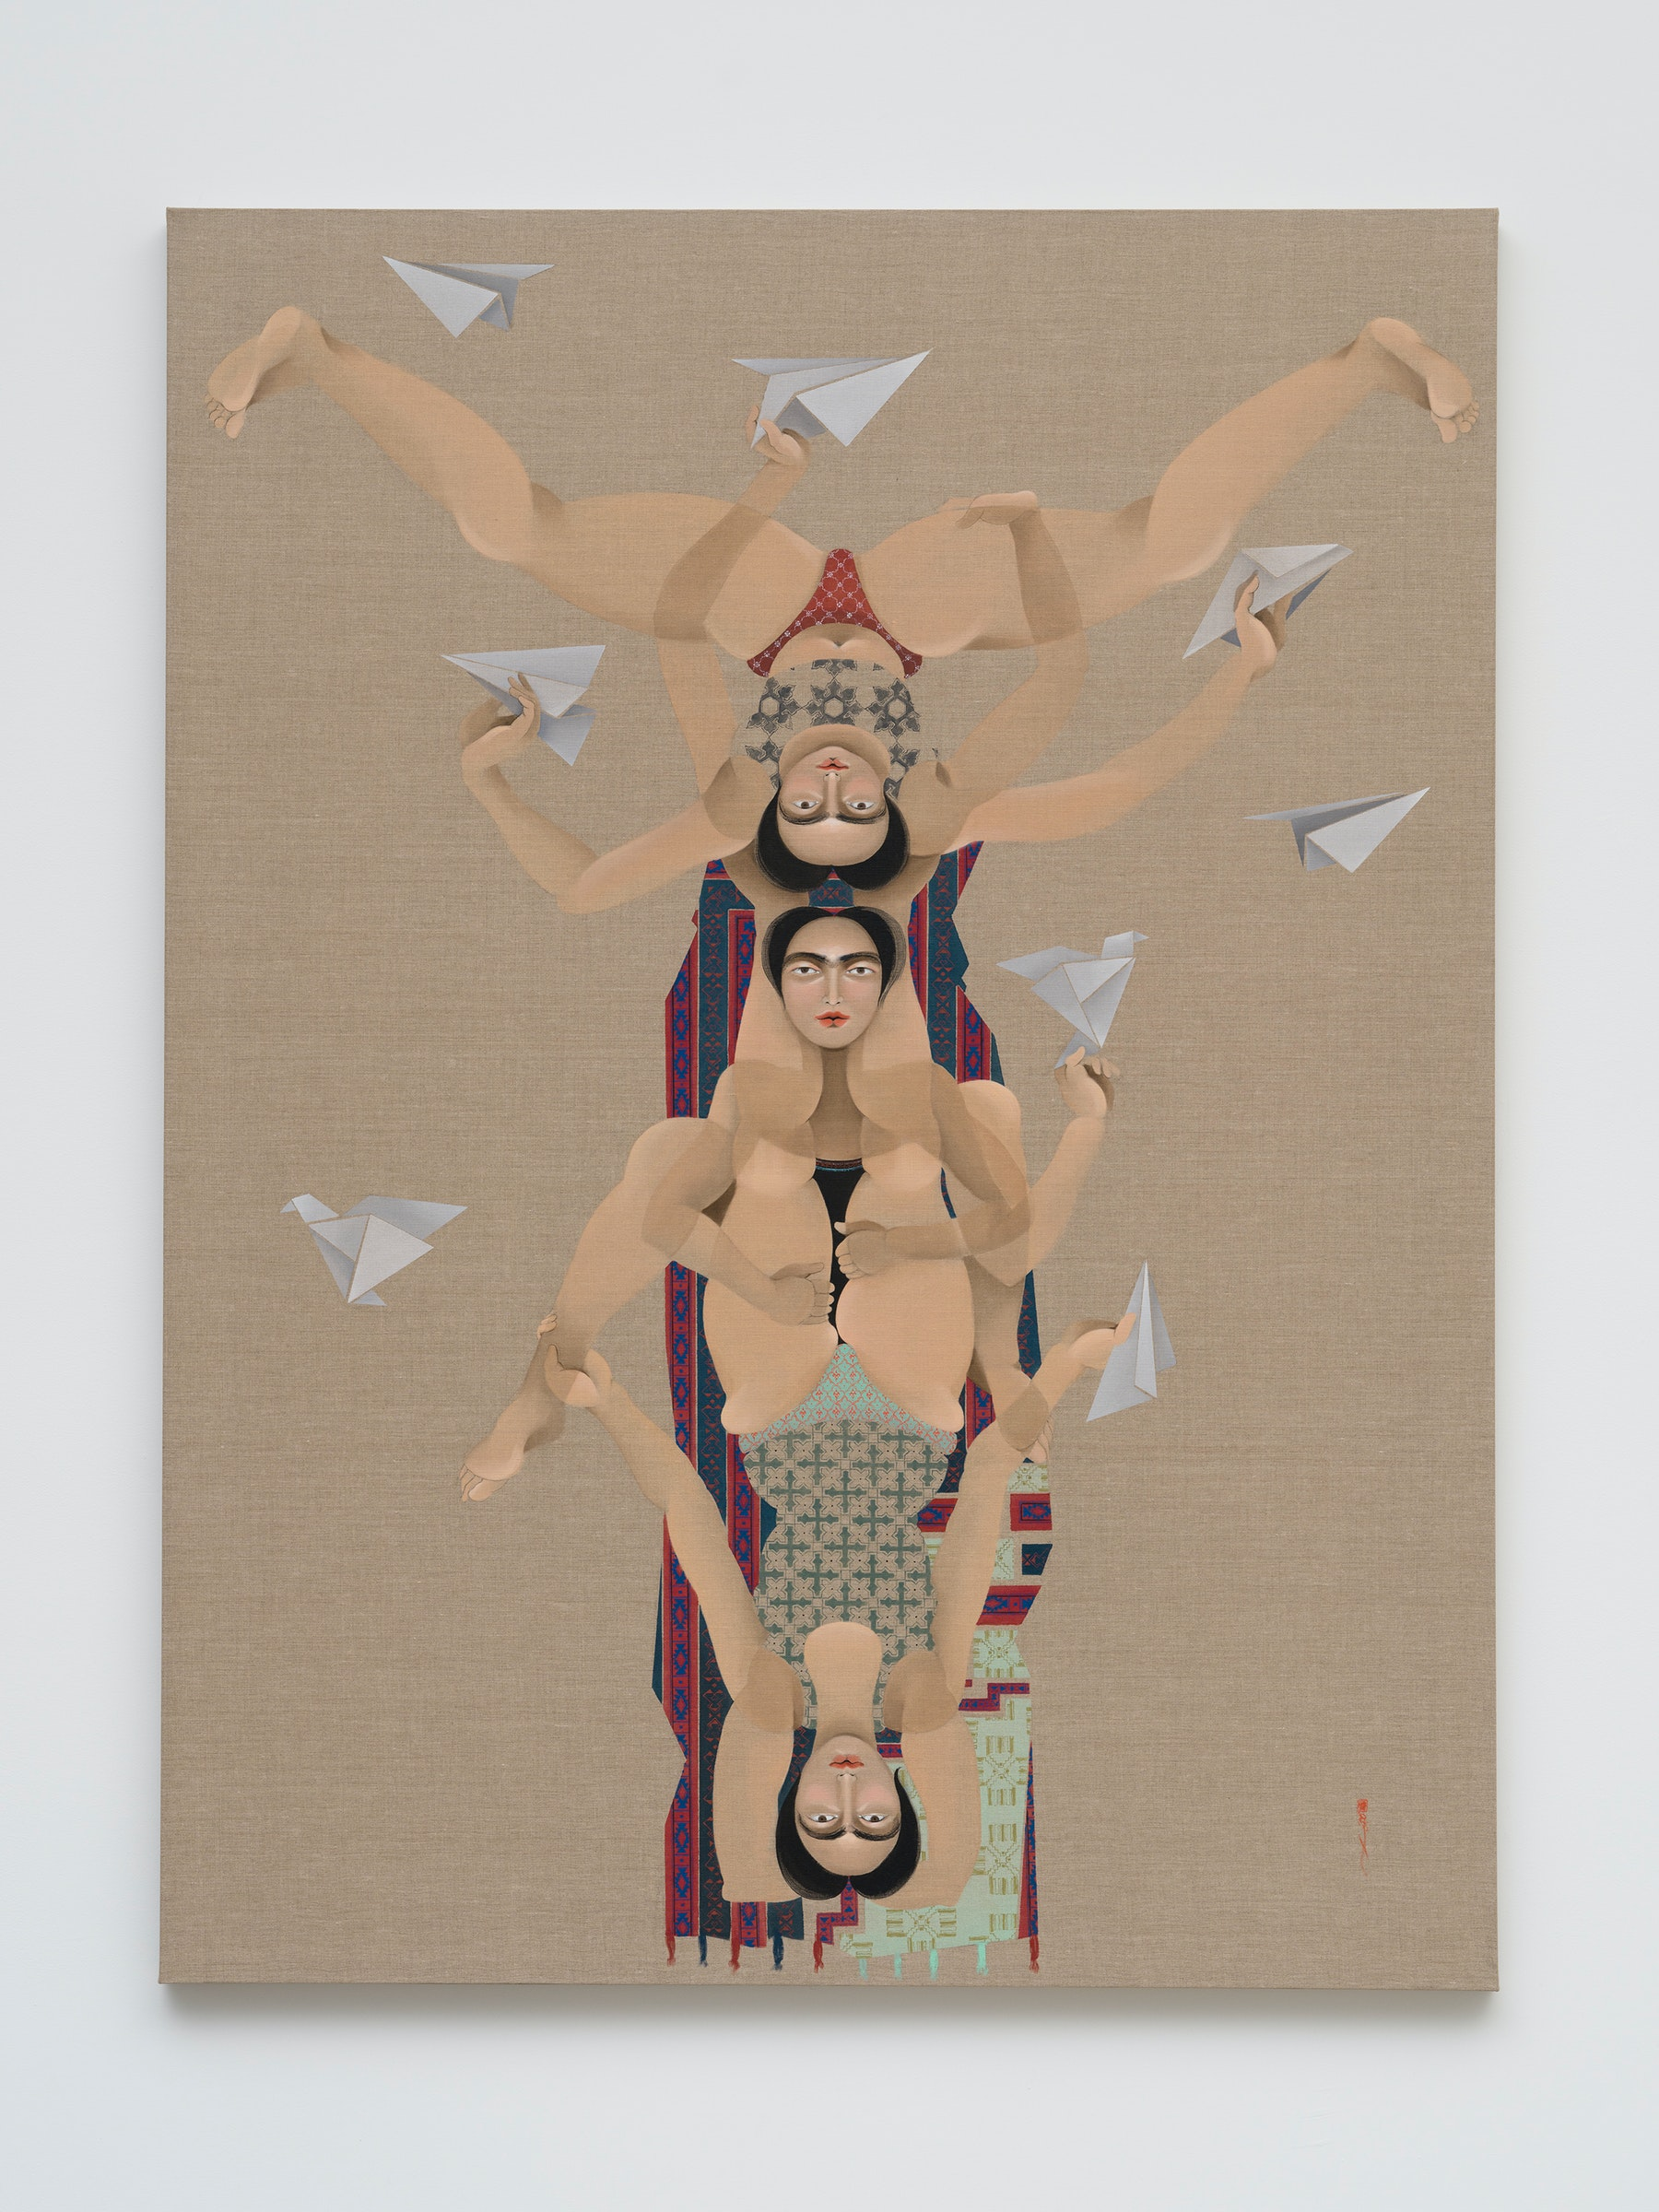 "Hayv Kahraman ""Paper planes,"" 2021 Oil on linen 80"" x 60"" [HxW] (203.2 x 152.4 cm) Inventory #KAR183 Courtesy of the artist and Vielmetter Los Angeles Photo credit: Jeff Mclane"